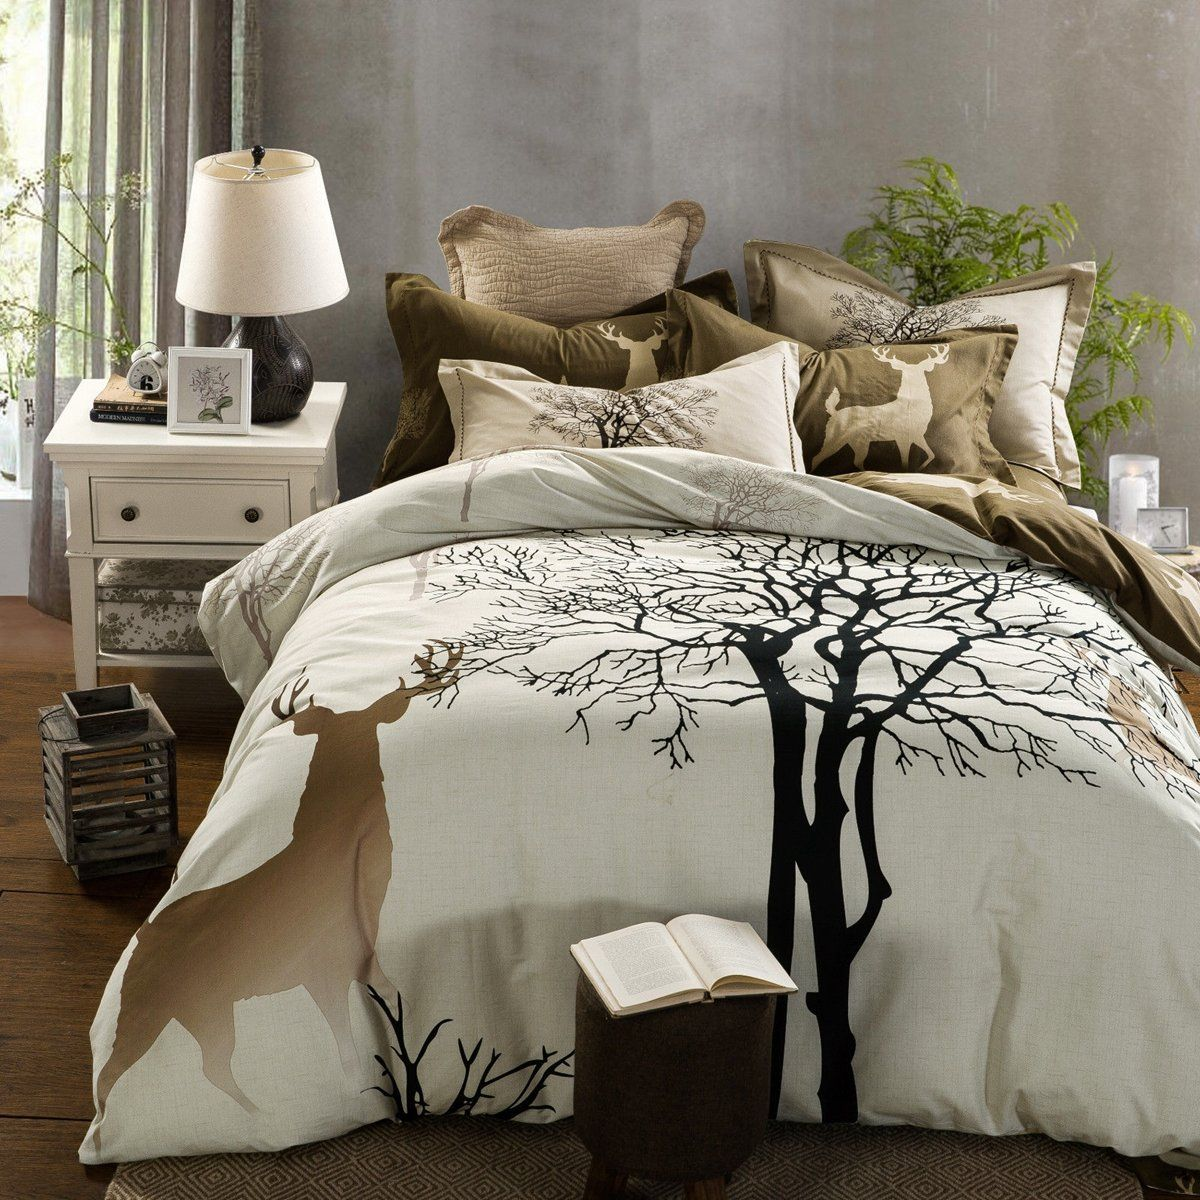 Animal Deer Cotton Single Double King Size Bedding Pillowcases